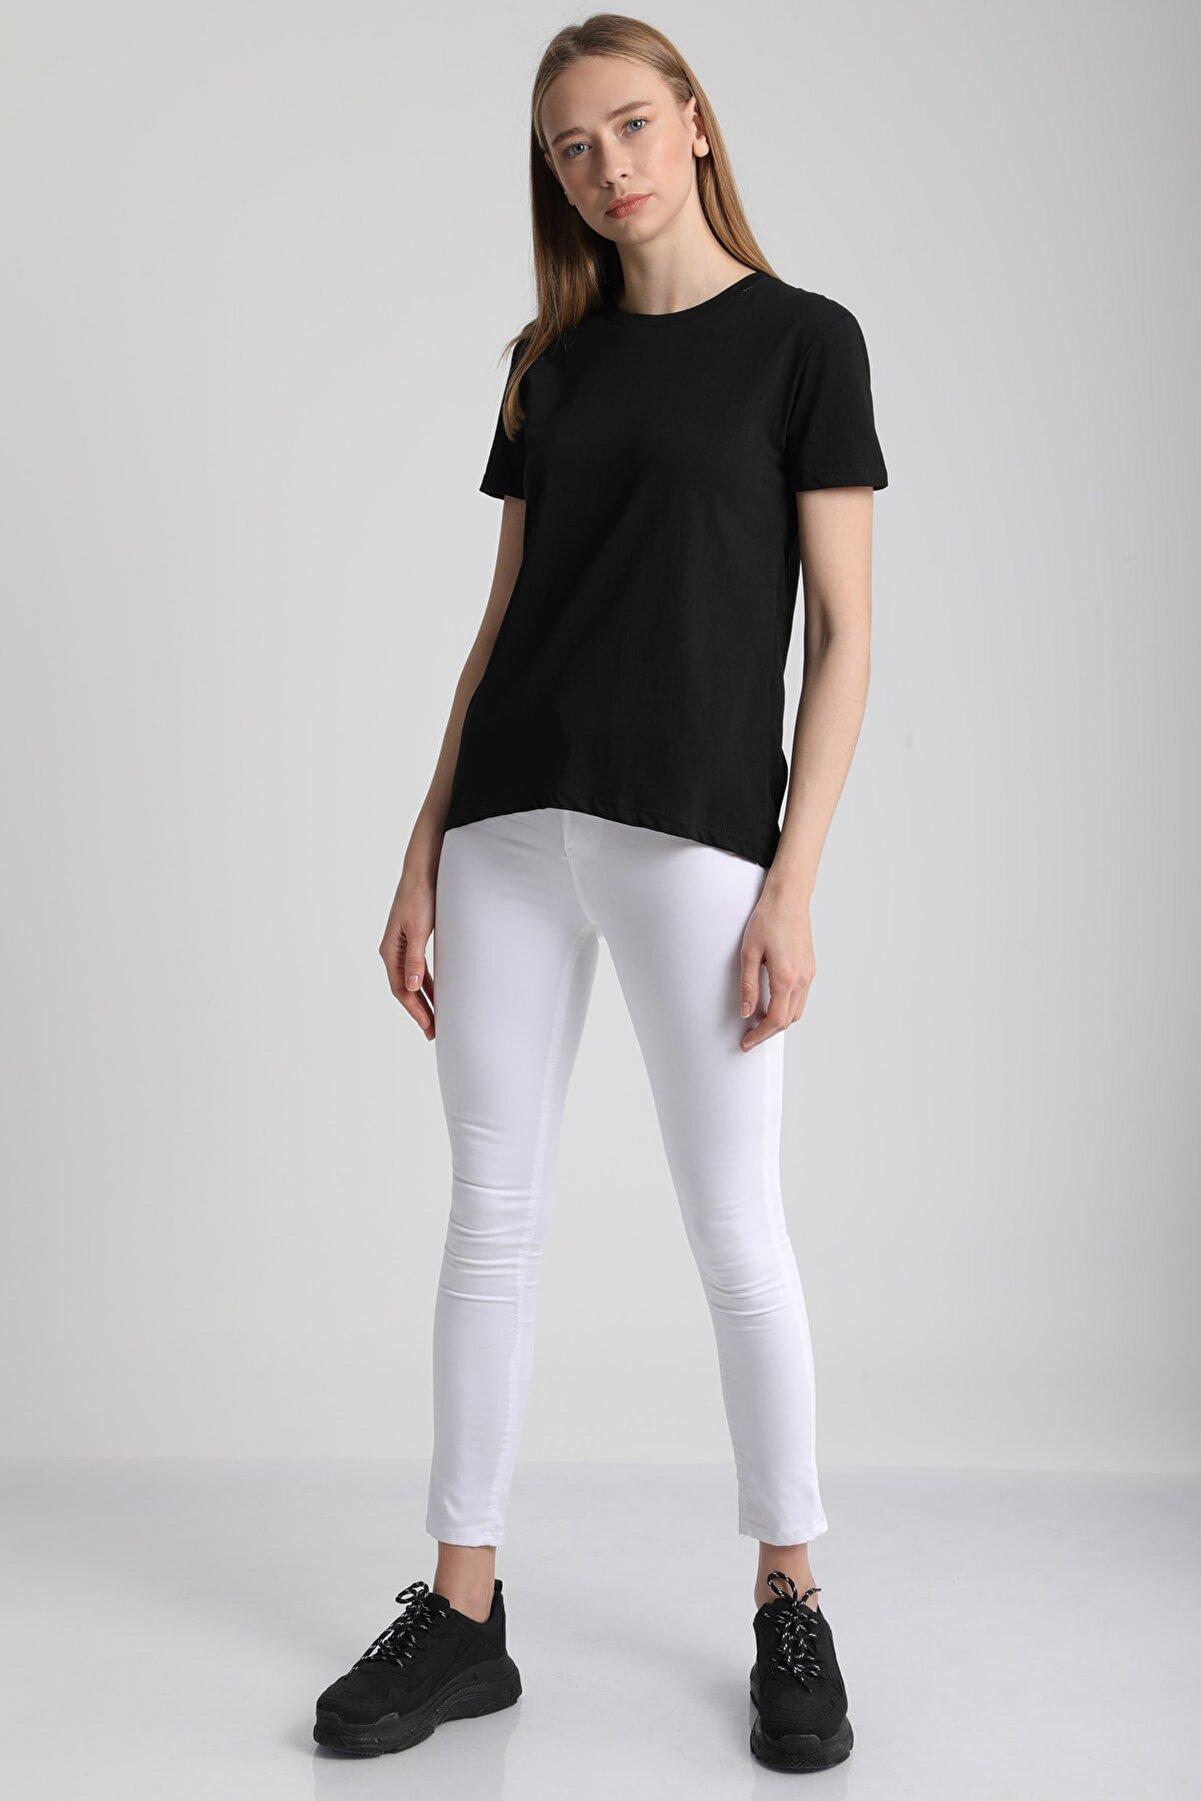 MD trend Kadın Siyah Bisiklet Yaka Kısa Kol Pamuklu T-Shirt Mdt3091